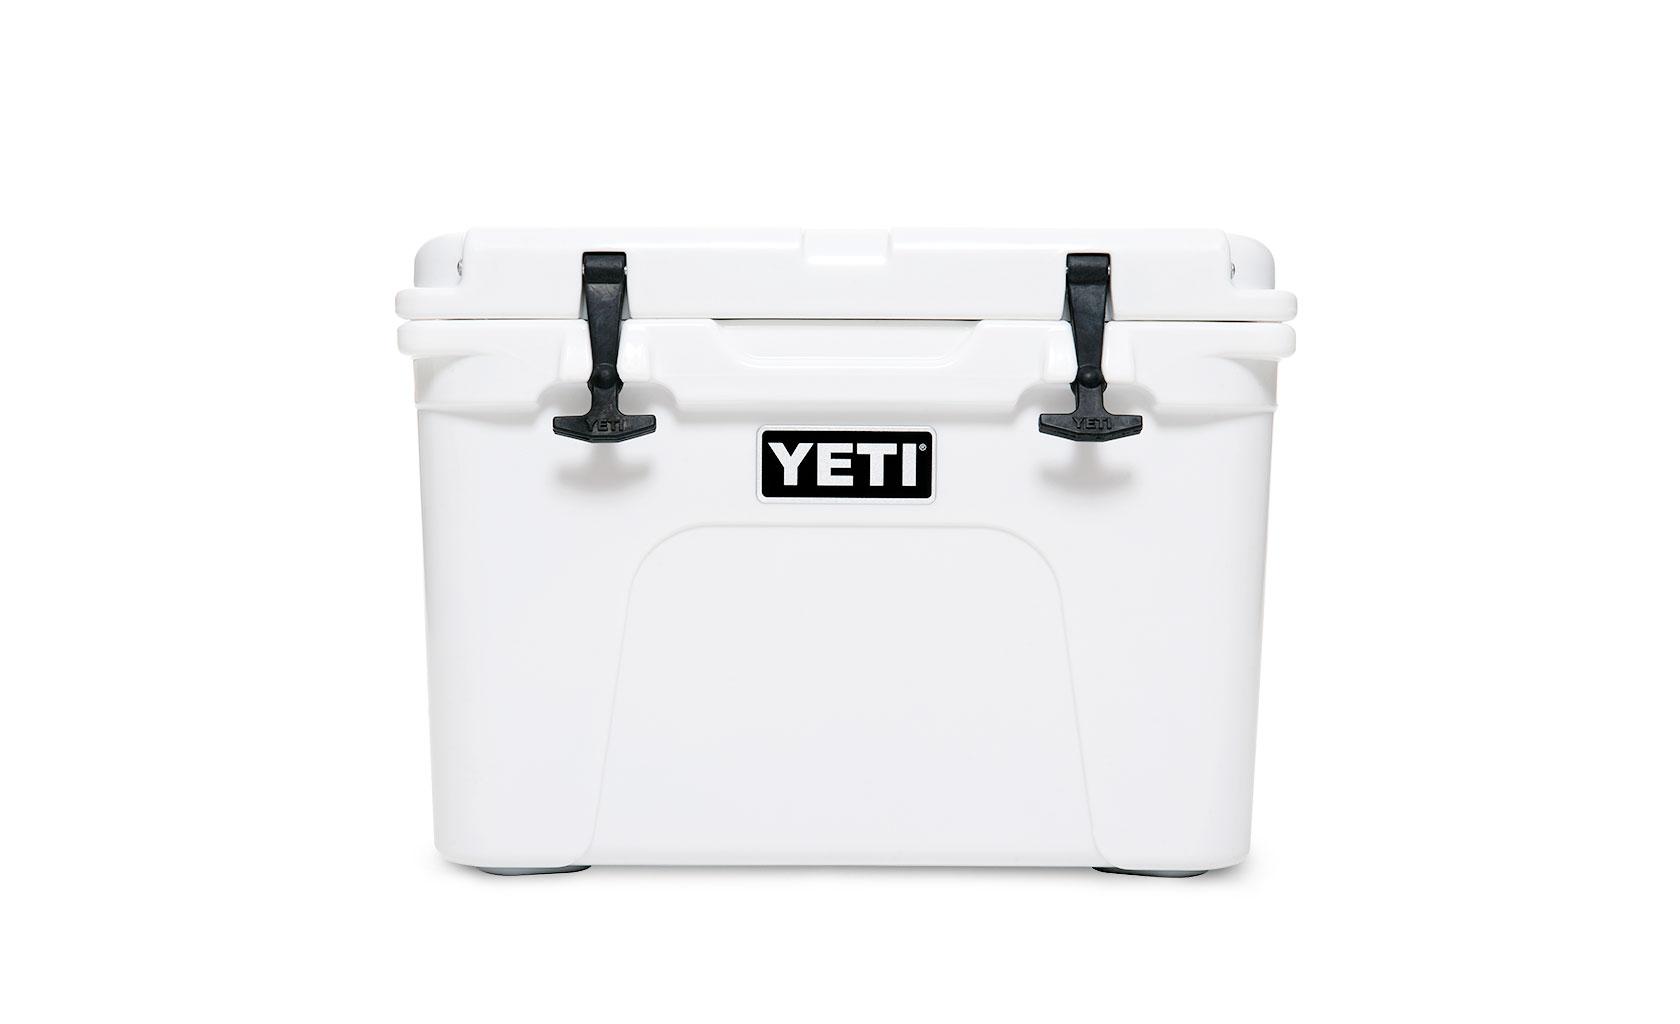 Roadie 20 Cooler Yeti Budweiser Mini Fridge Wiring Diagram Tundra 35